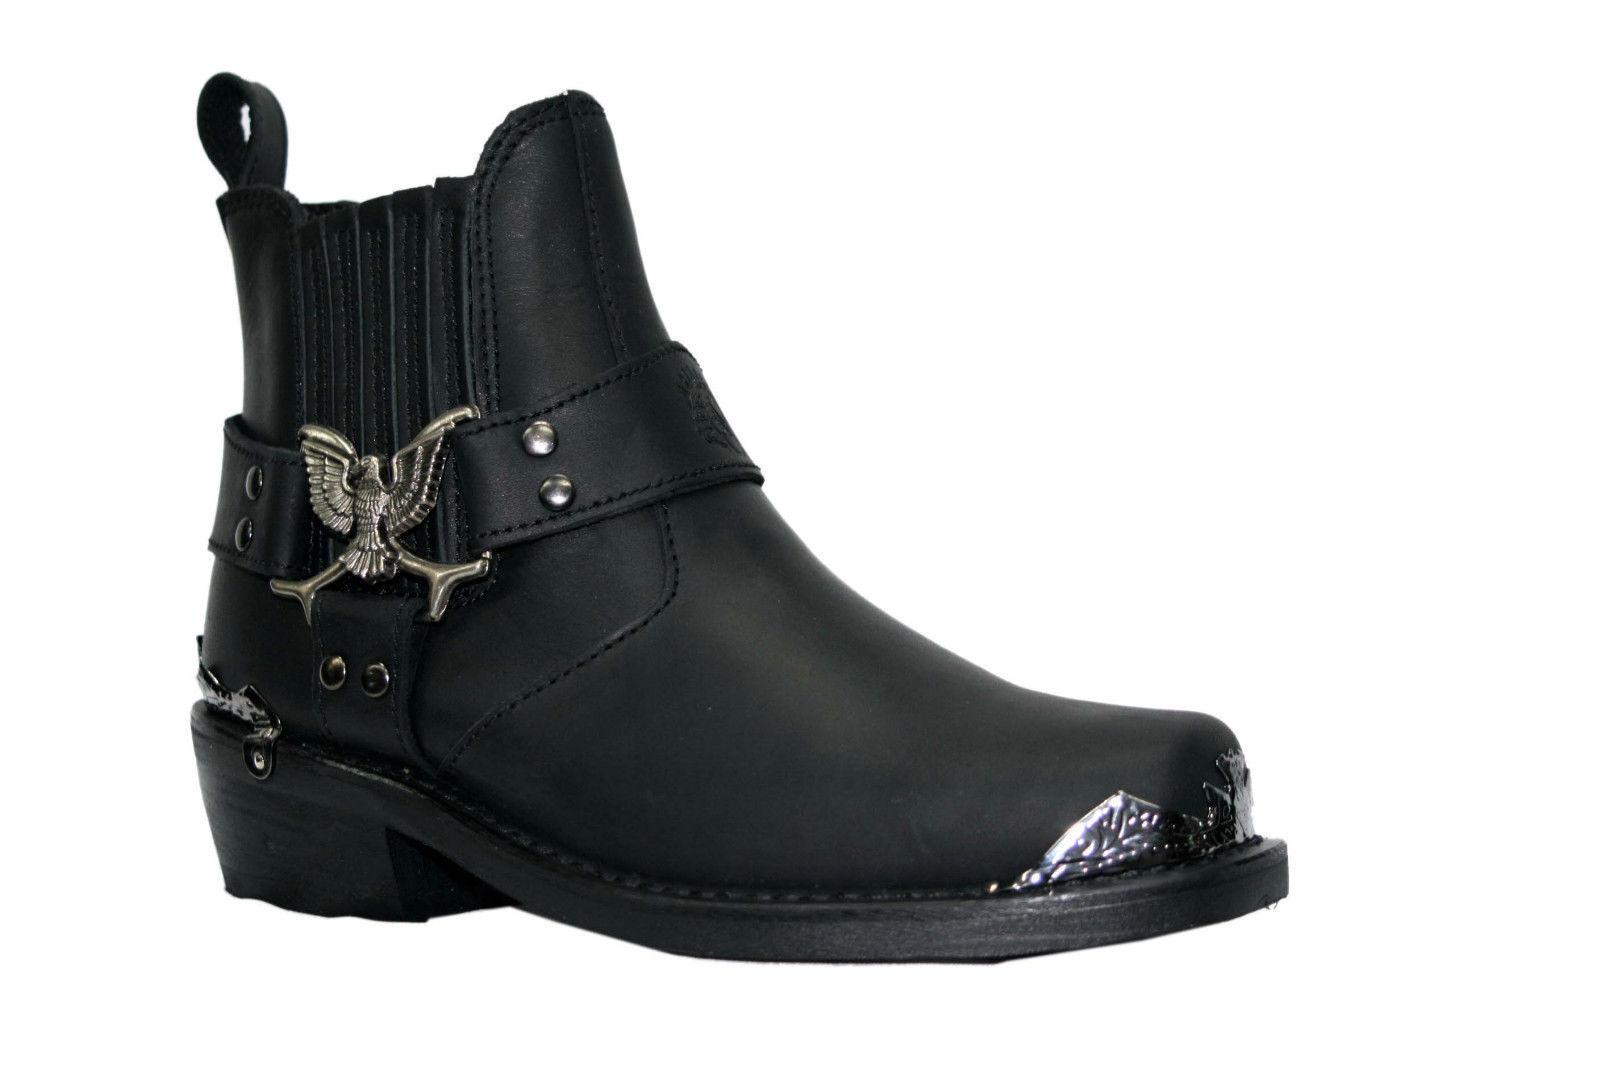 Grinders New Eagle Lo Black Mens Leather Cowboy Biker Ankle Western Boots Shoes